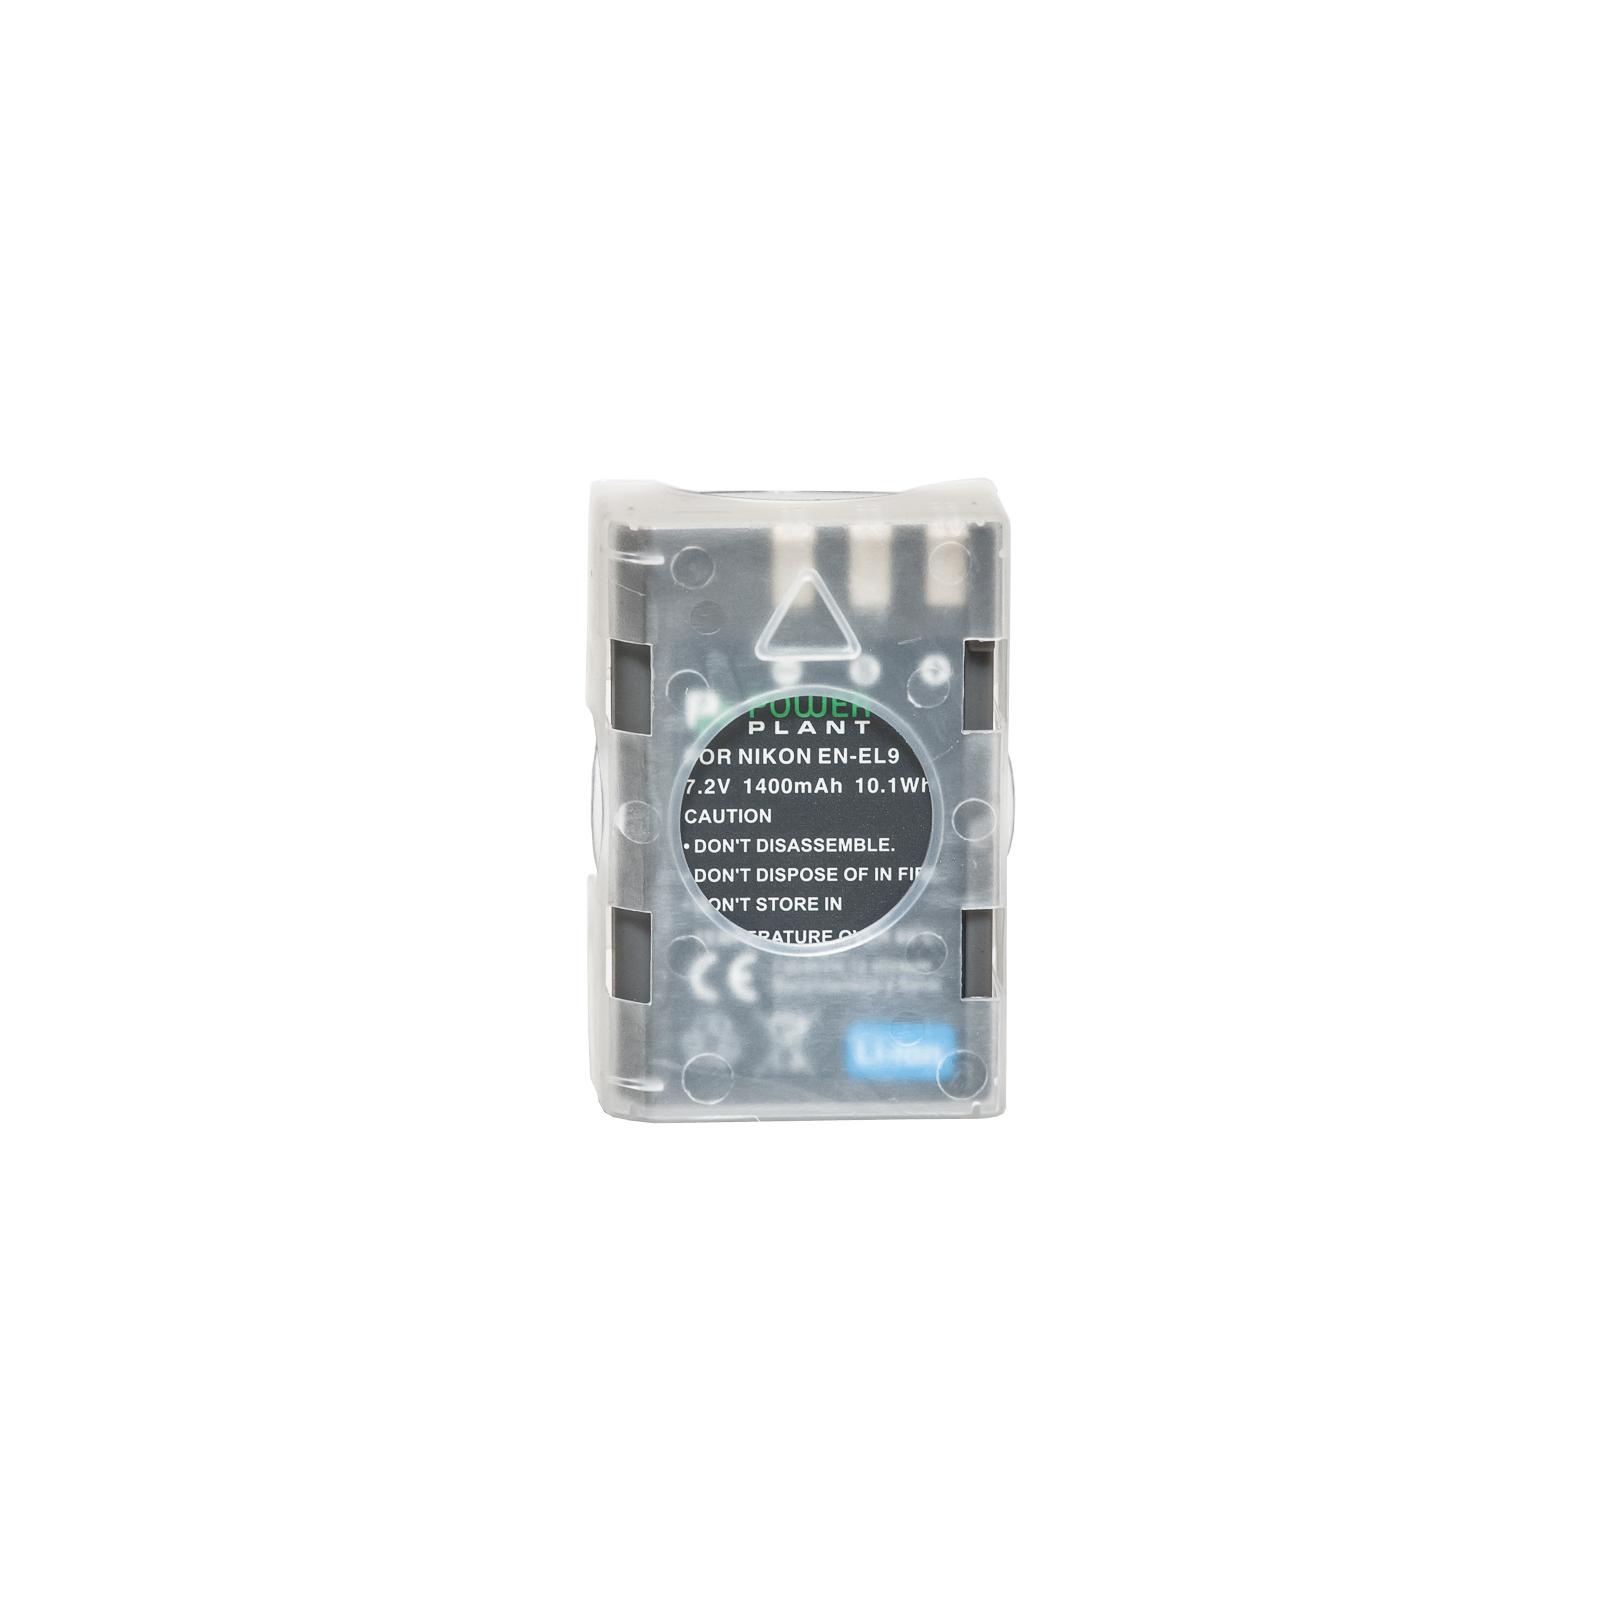 Аккумулятор к фото/видео Nikon EN-EL9 PowerPlant (DV00DV1173) изображение 2